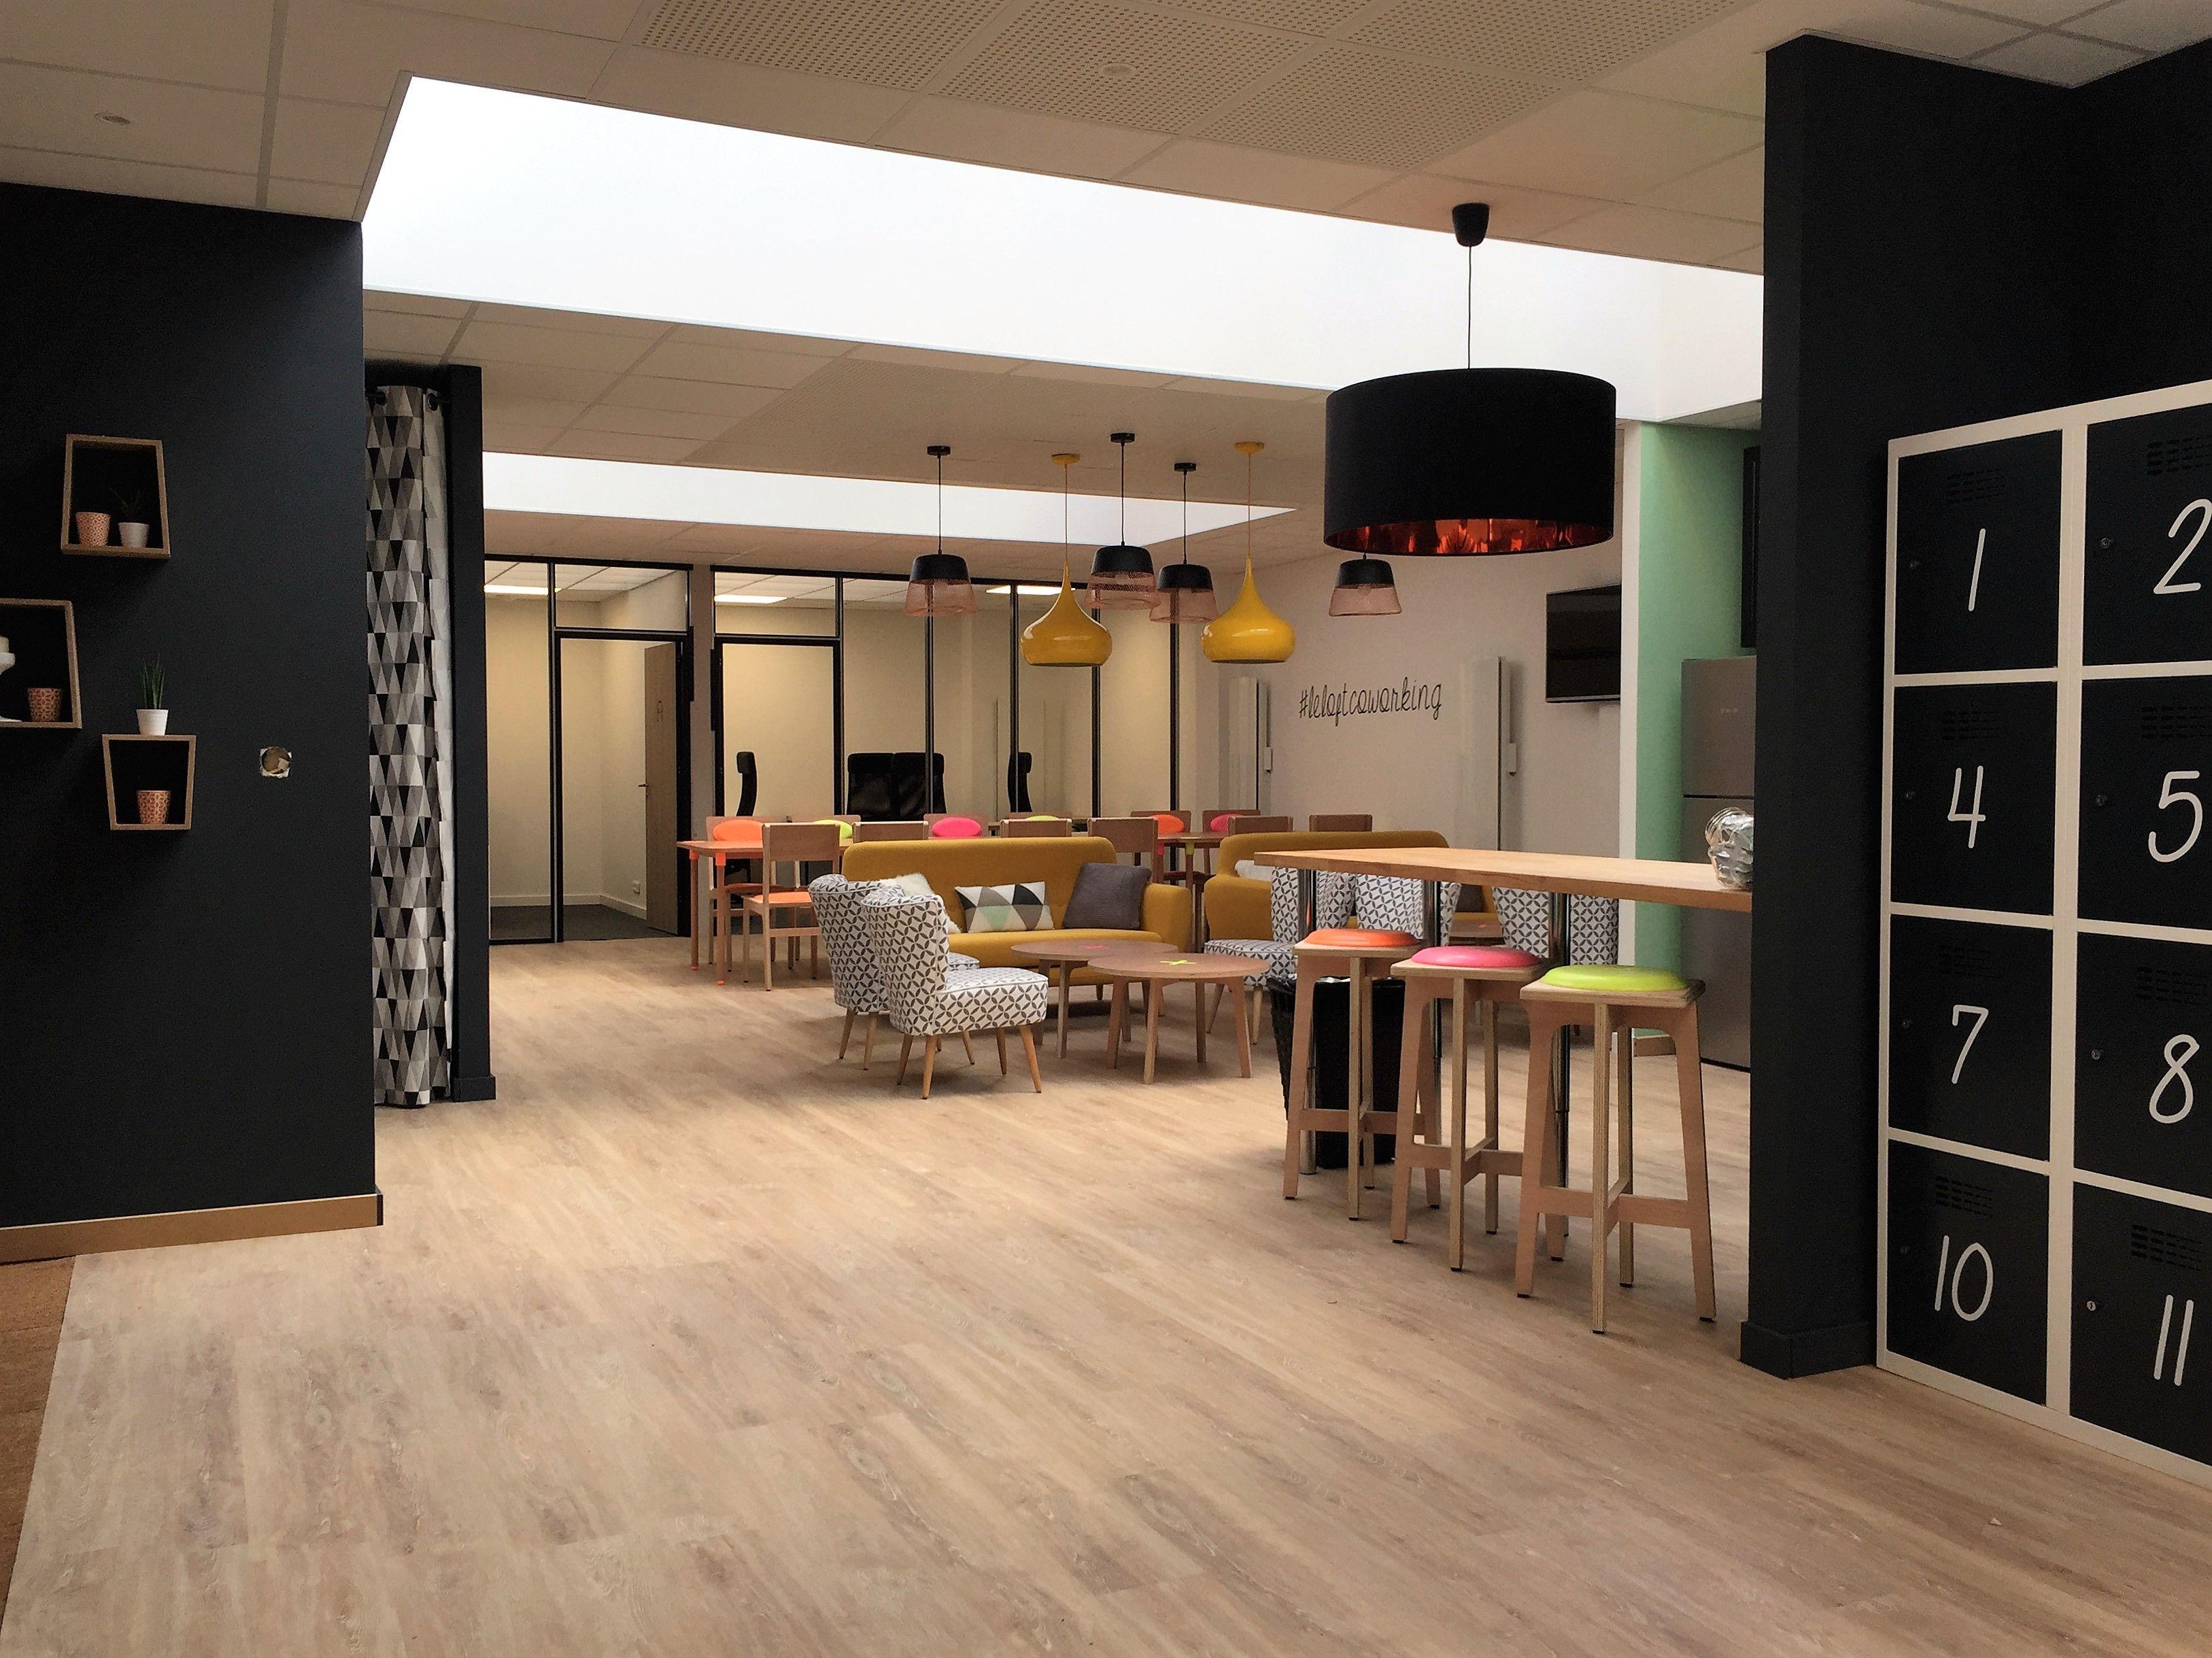 loft coworking un ancien bureau d huissier de justice transform en loft huissiers bureau. Black Bedroom Furniture Sets. Home Design Ideas